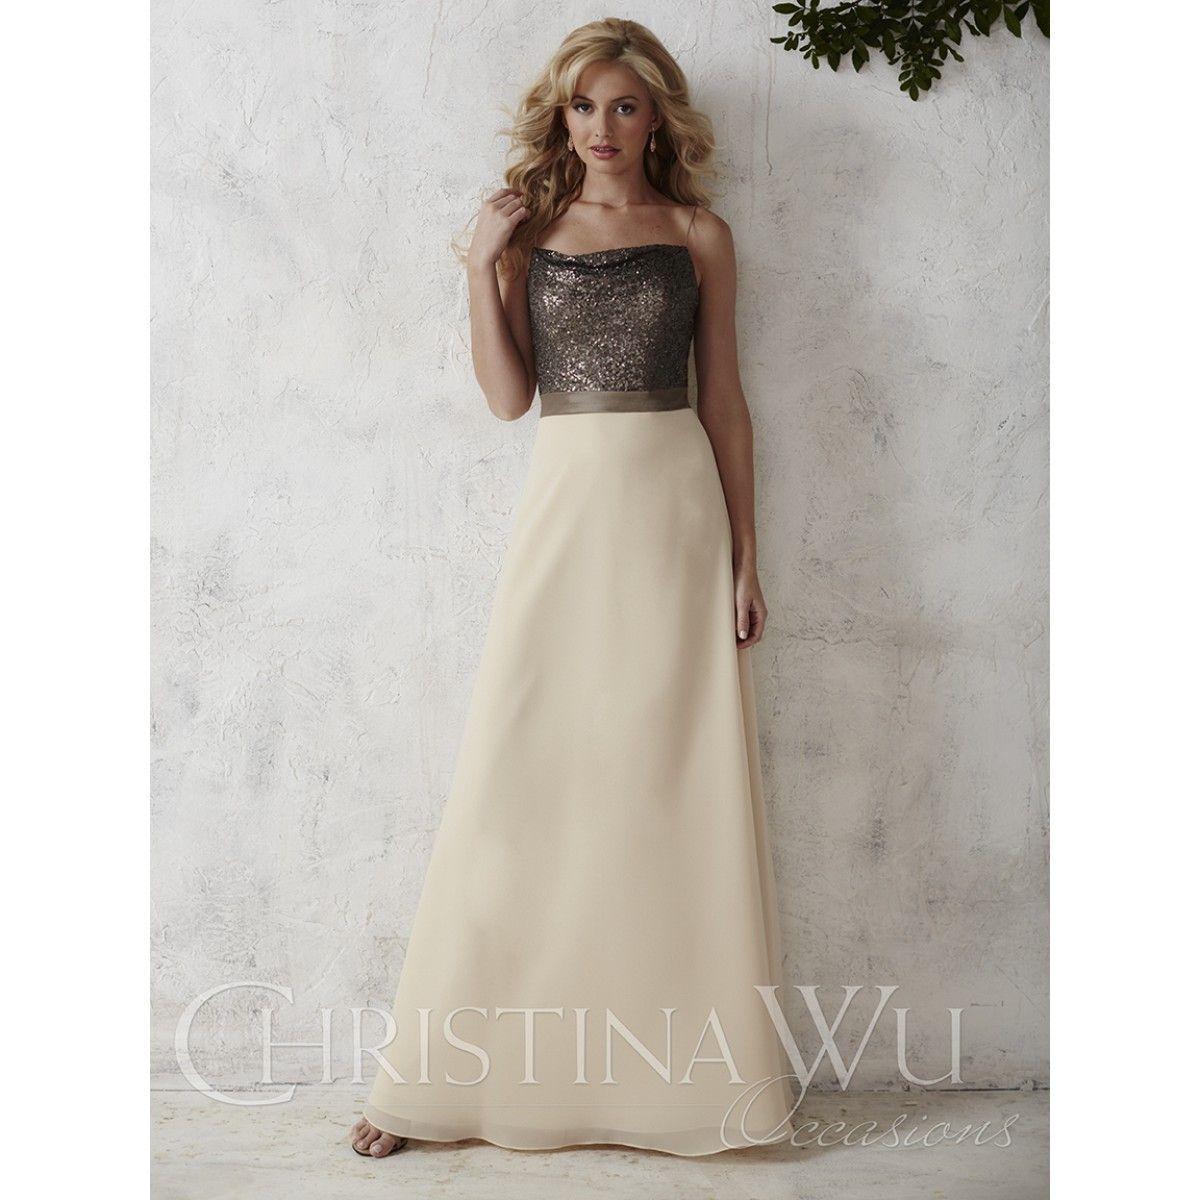 Bridesmaid Dress Available at Ella Park Bridal | Newburgh, IN | 812.853.1800 | Christina Wu Occasions - Style 22666